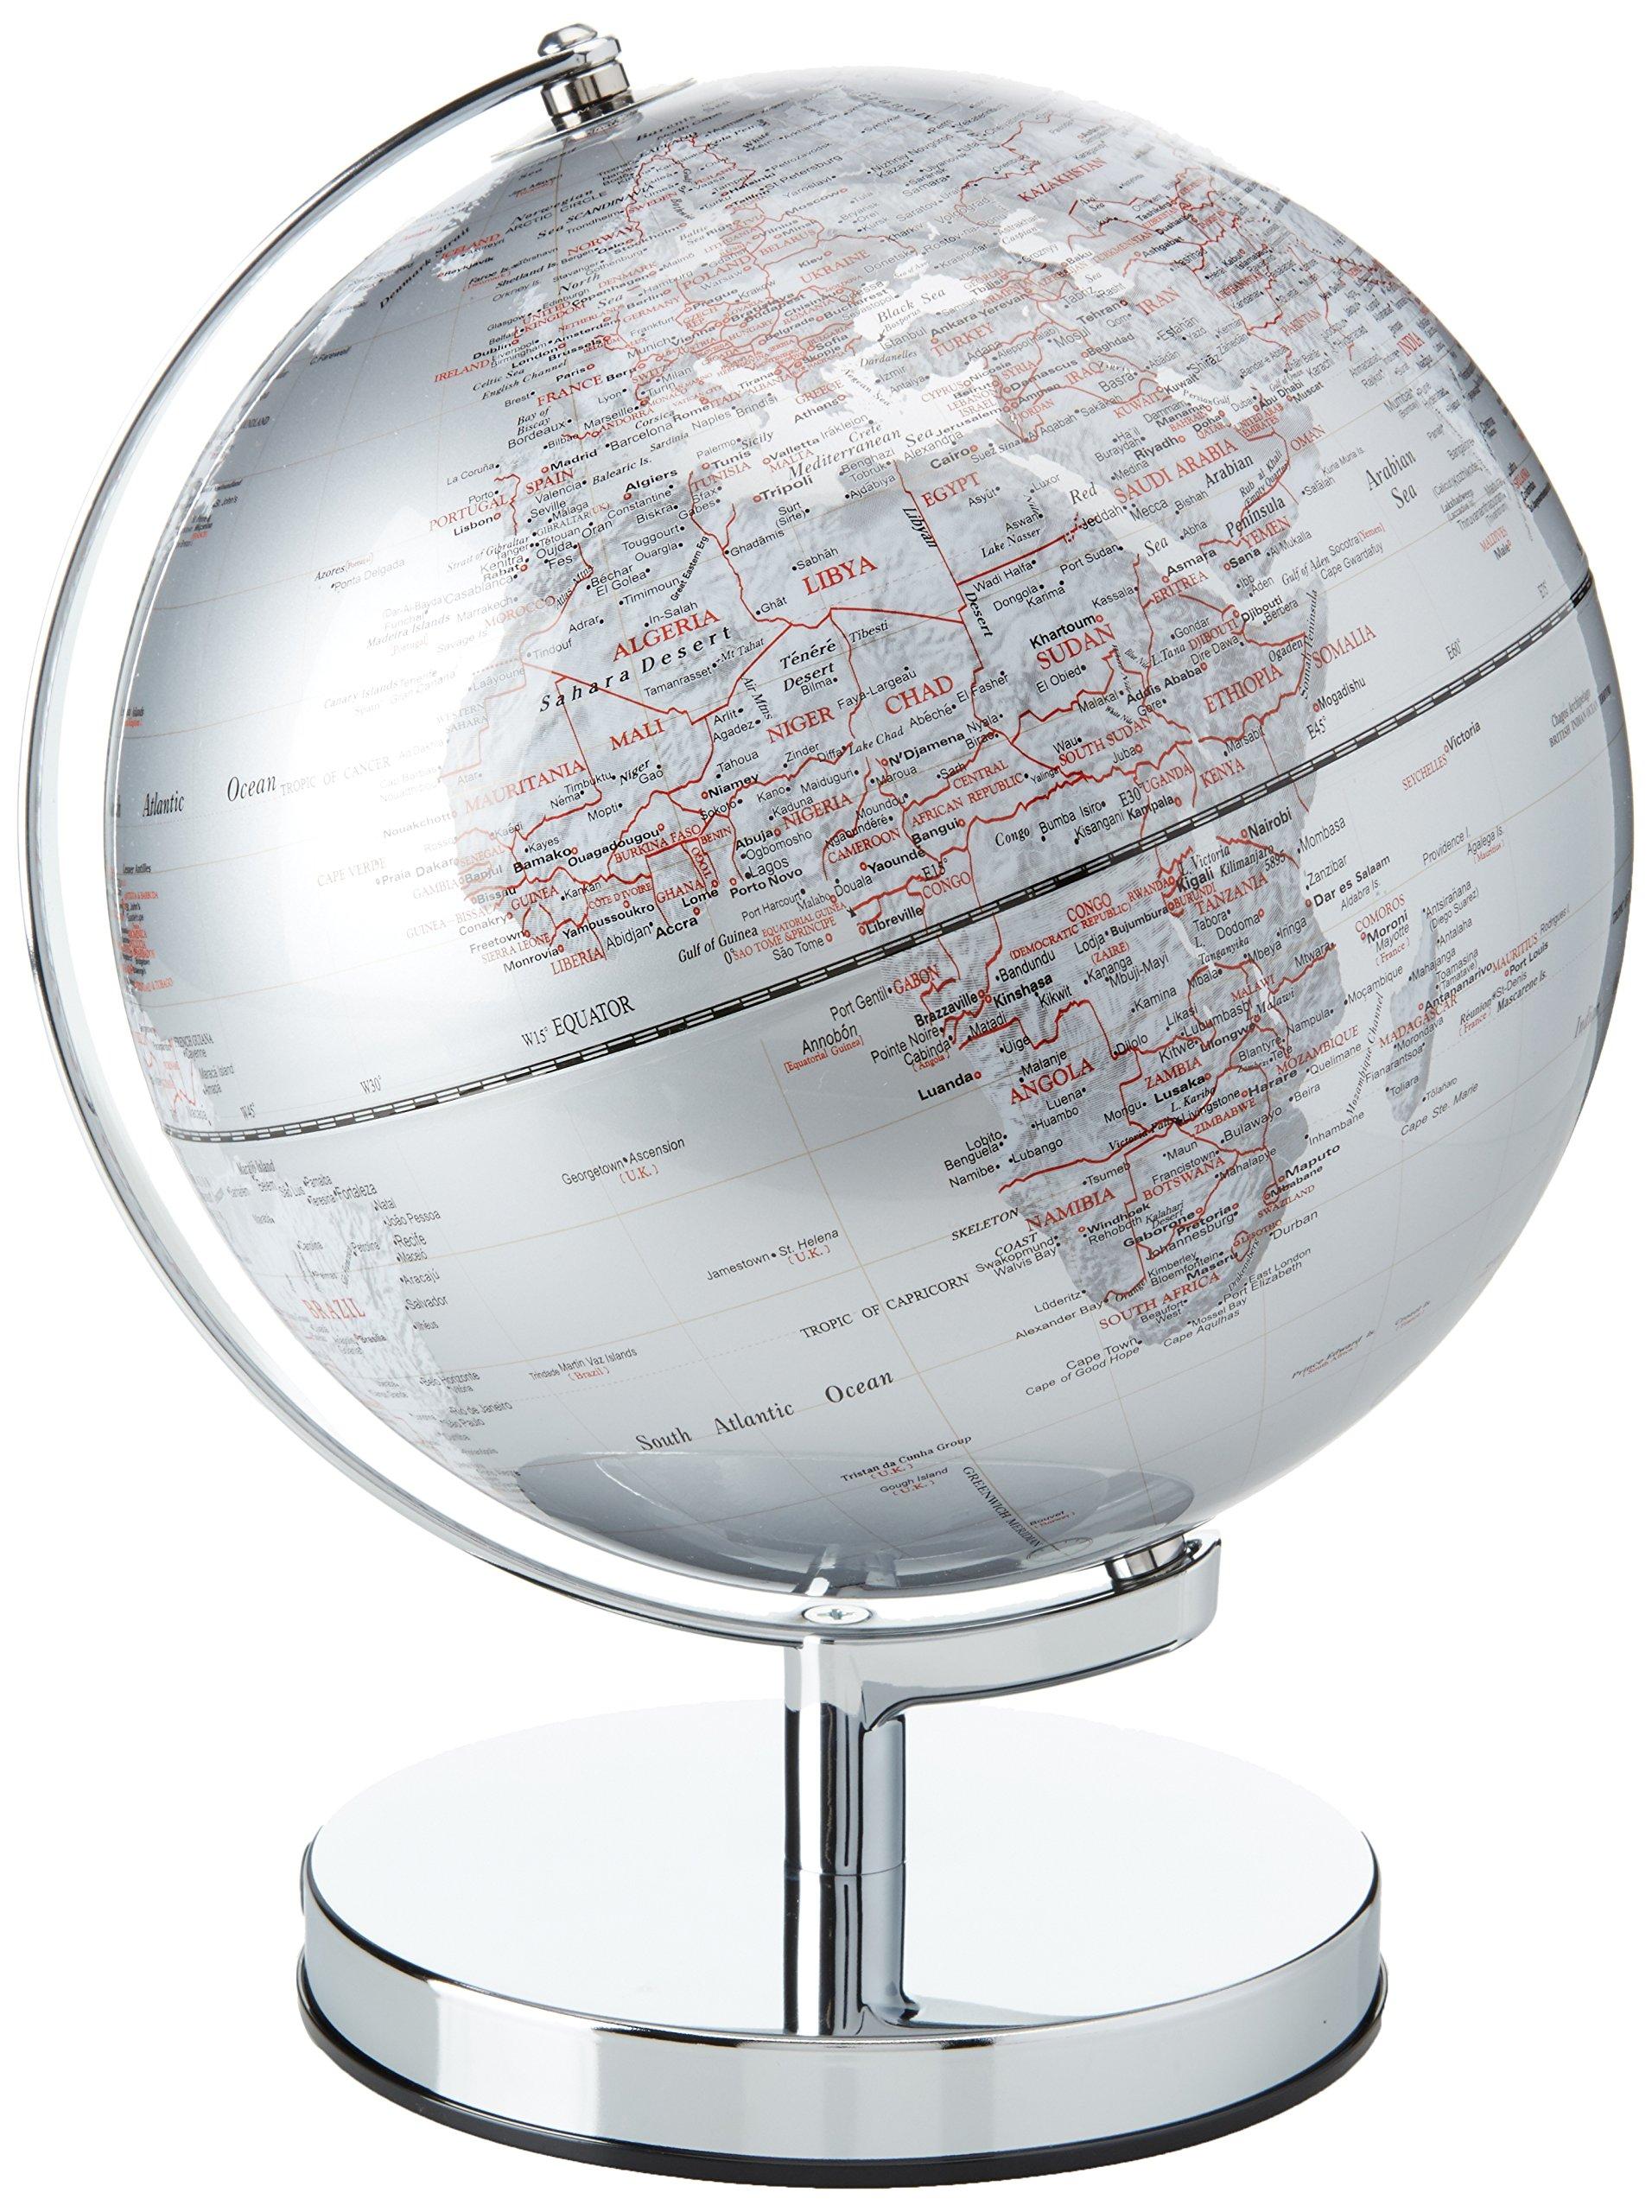 Wild and Wolf Gentlemen's Hardware Globe Light, 10 Inch Diameter